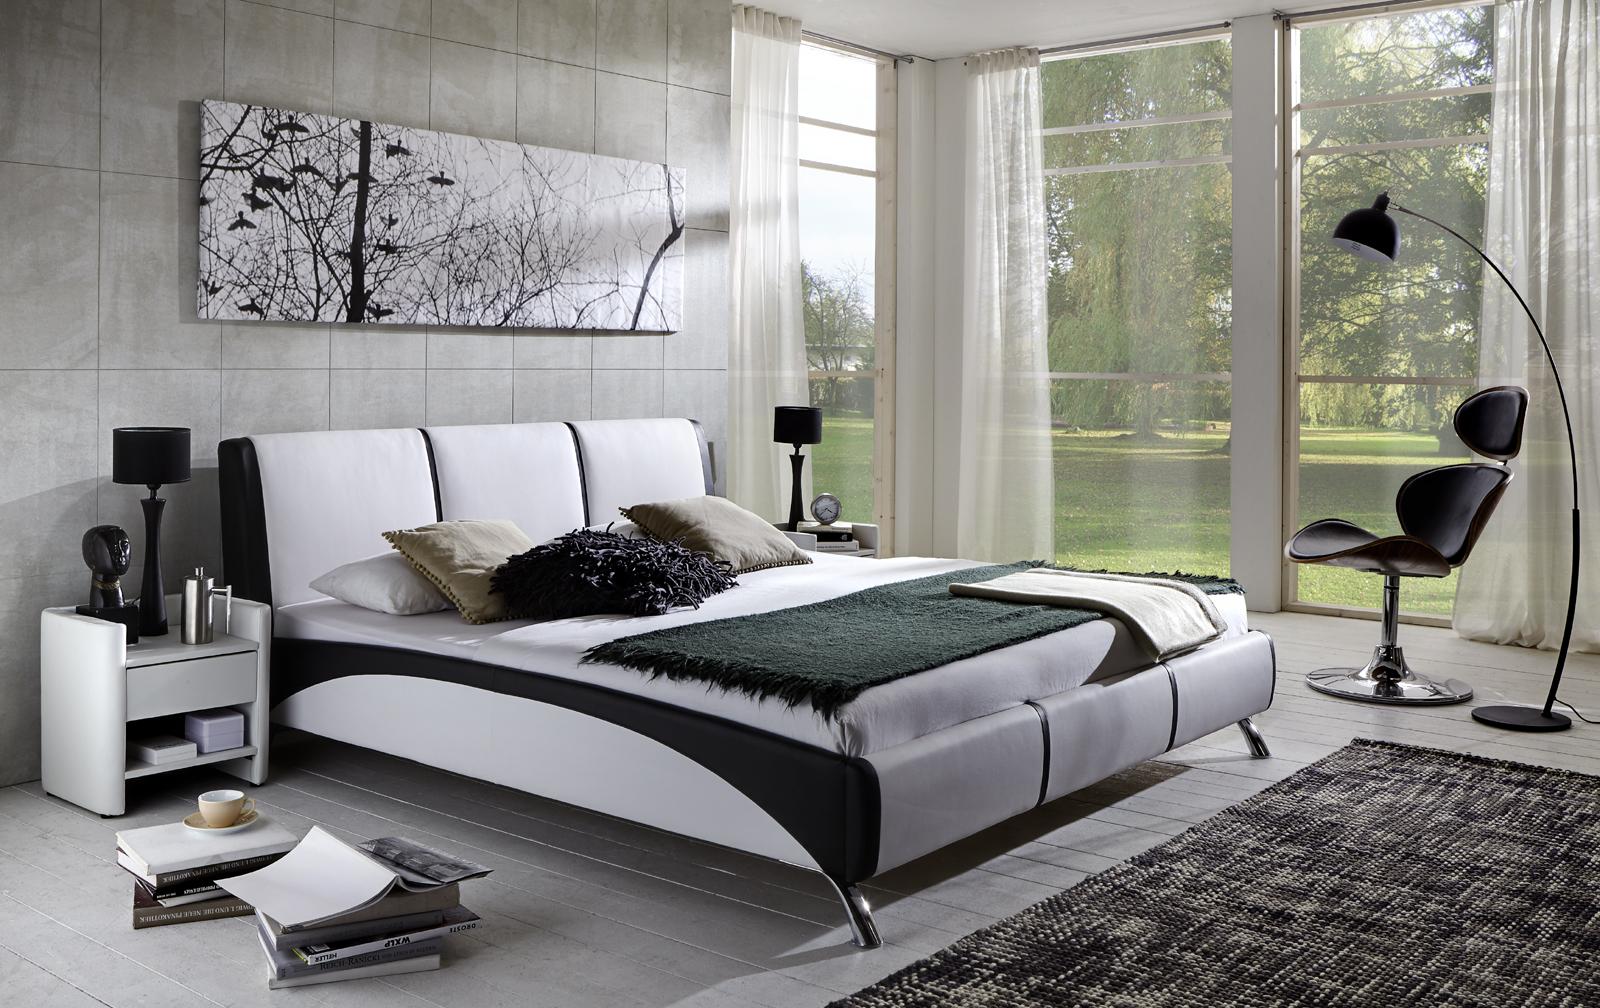 sam polsterbett 160cm wei schwarz soundsystemauswahl fun. Black Bedroom Furniture Sets. Home Design Ideas